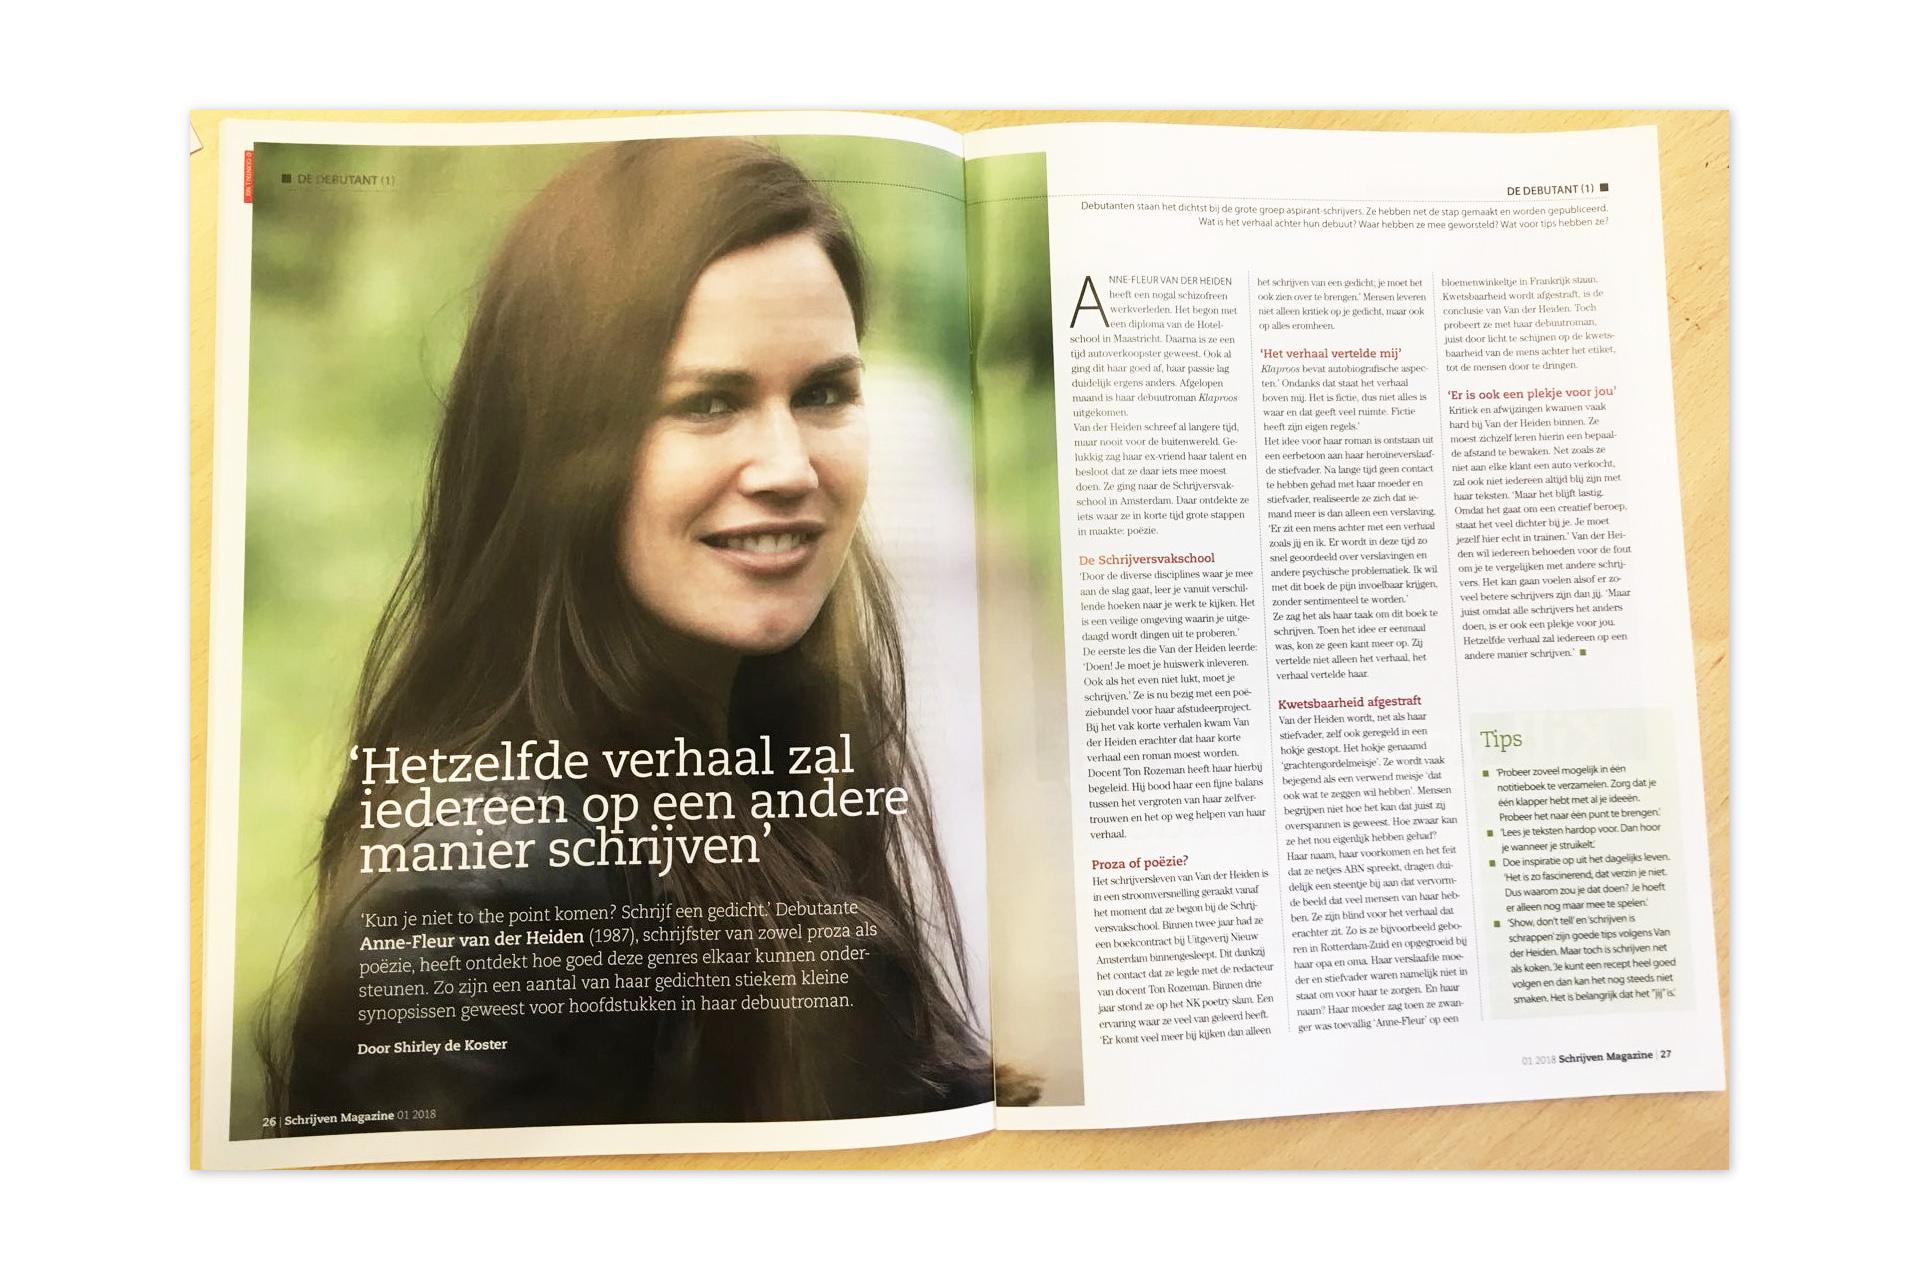 Schrijven magazine - interview - Klaproos - roman - Anne-Fleur van der Heiden